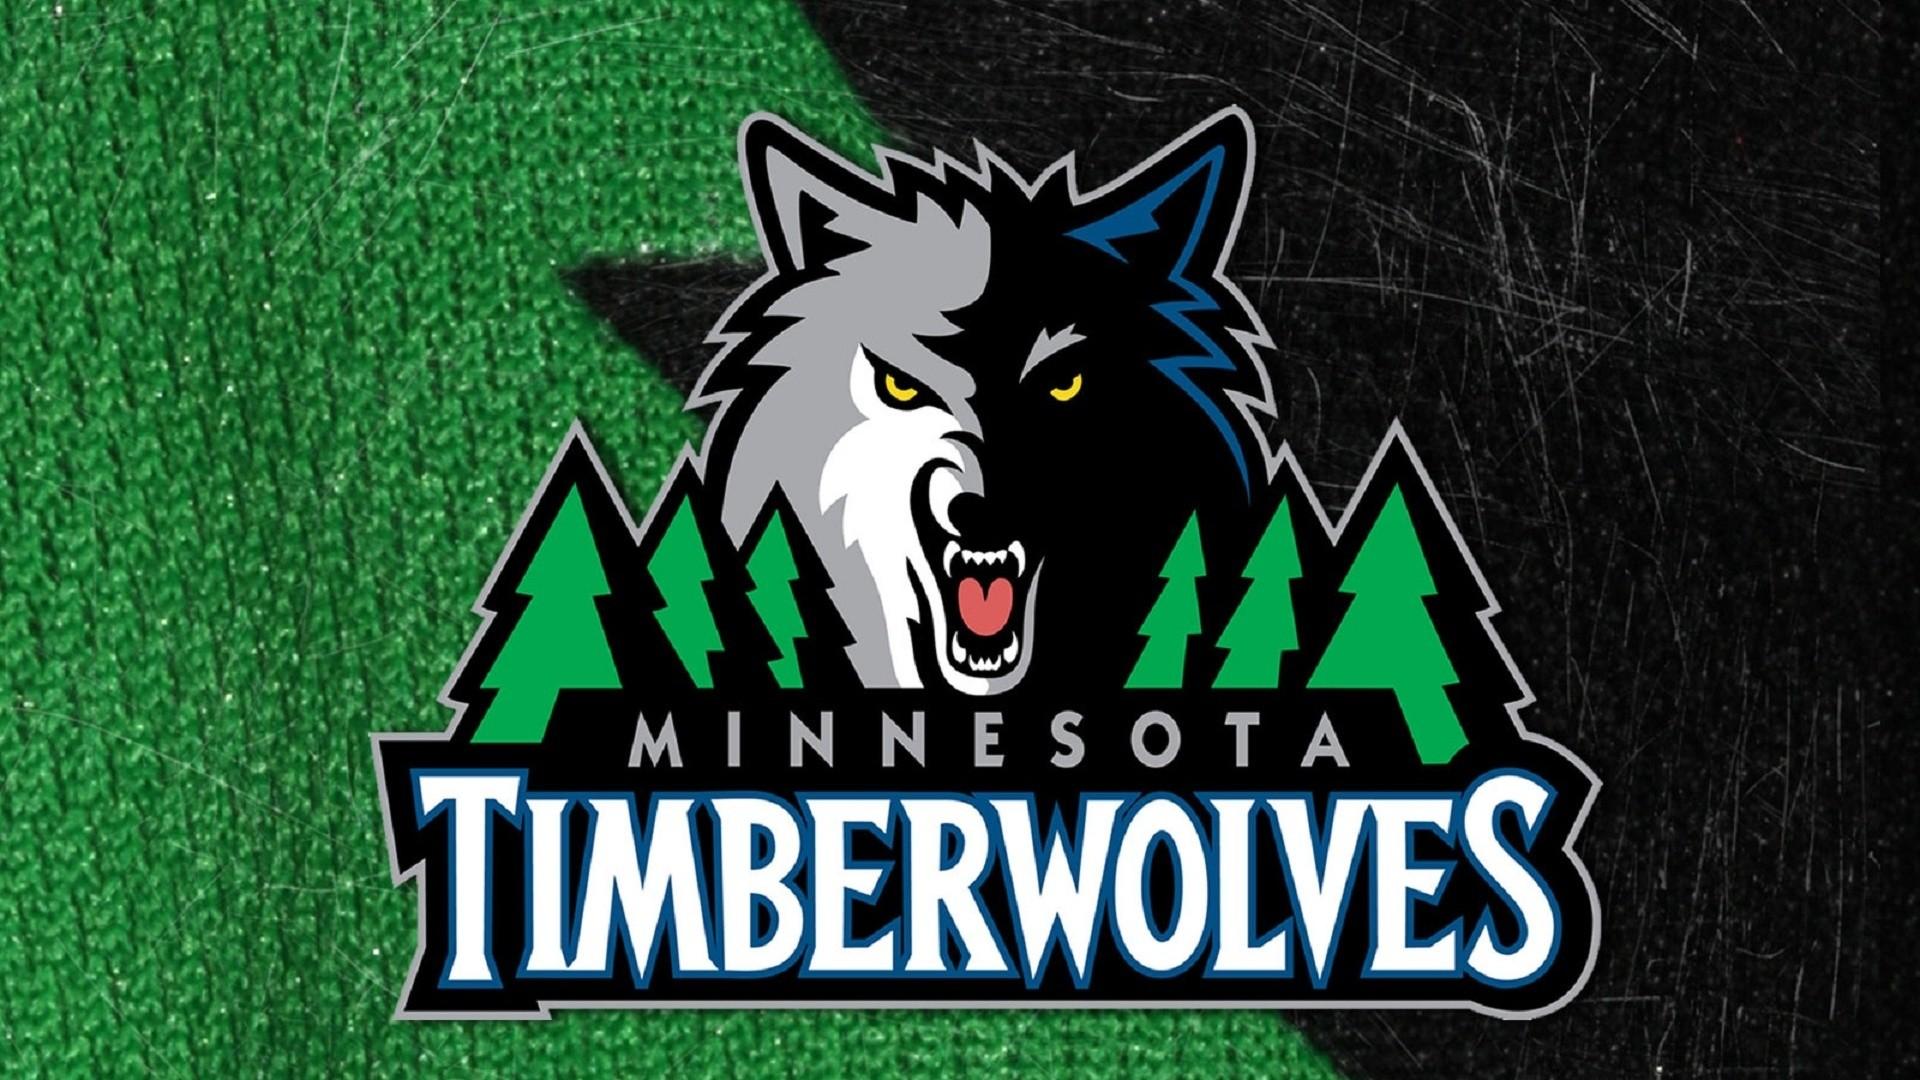 Minnesota Timberwolves Logo Wallpapers Group 1920×1080 Minnesota  Timberwolves Logo Wallpapers (44 Wallpapers)